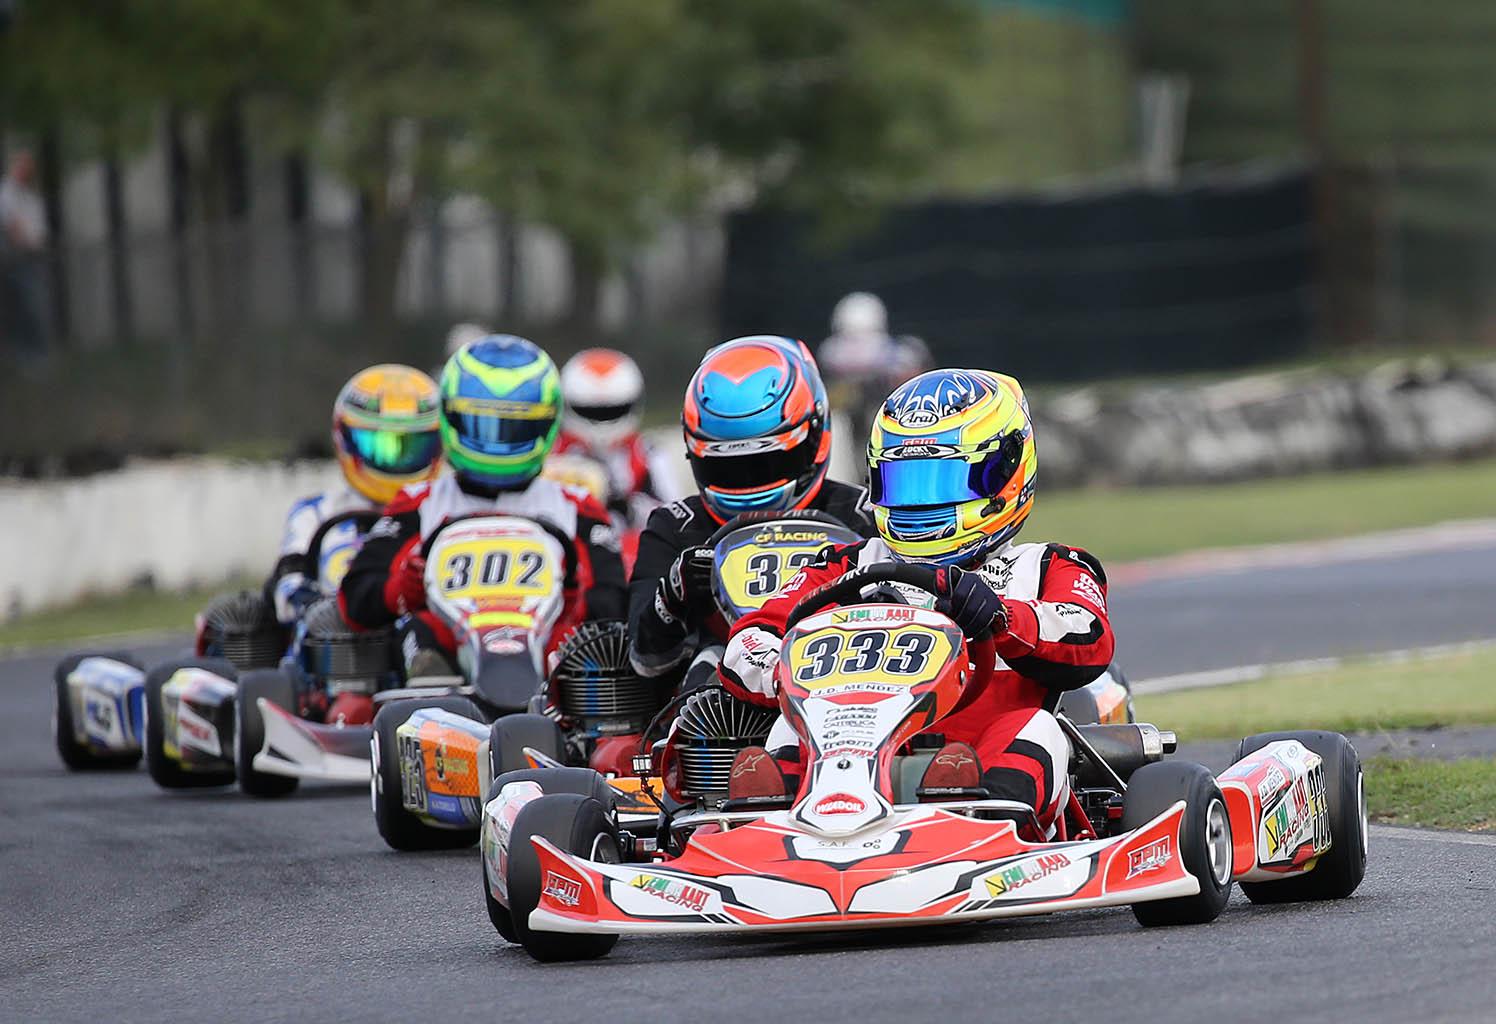 Easykart International Grand Finals - I nuovi campioni